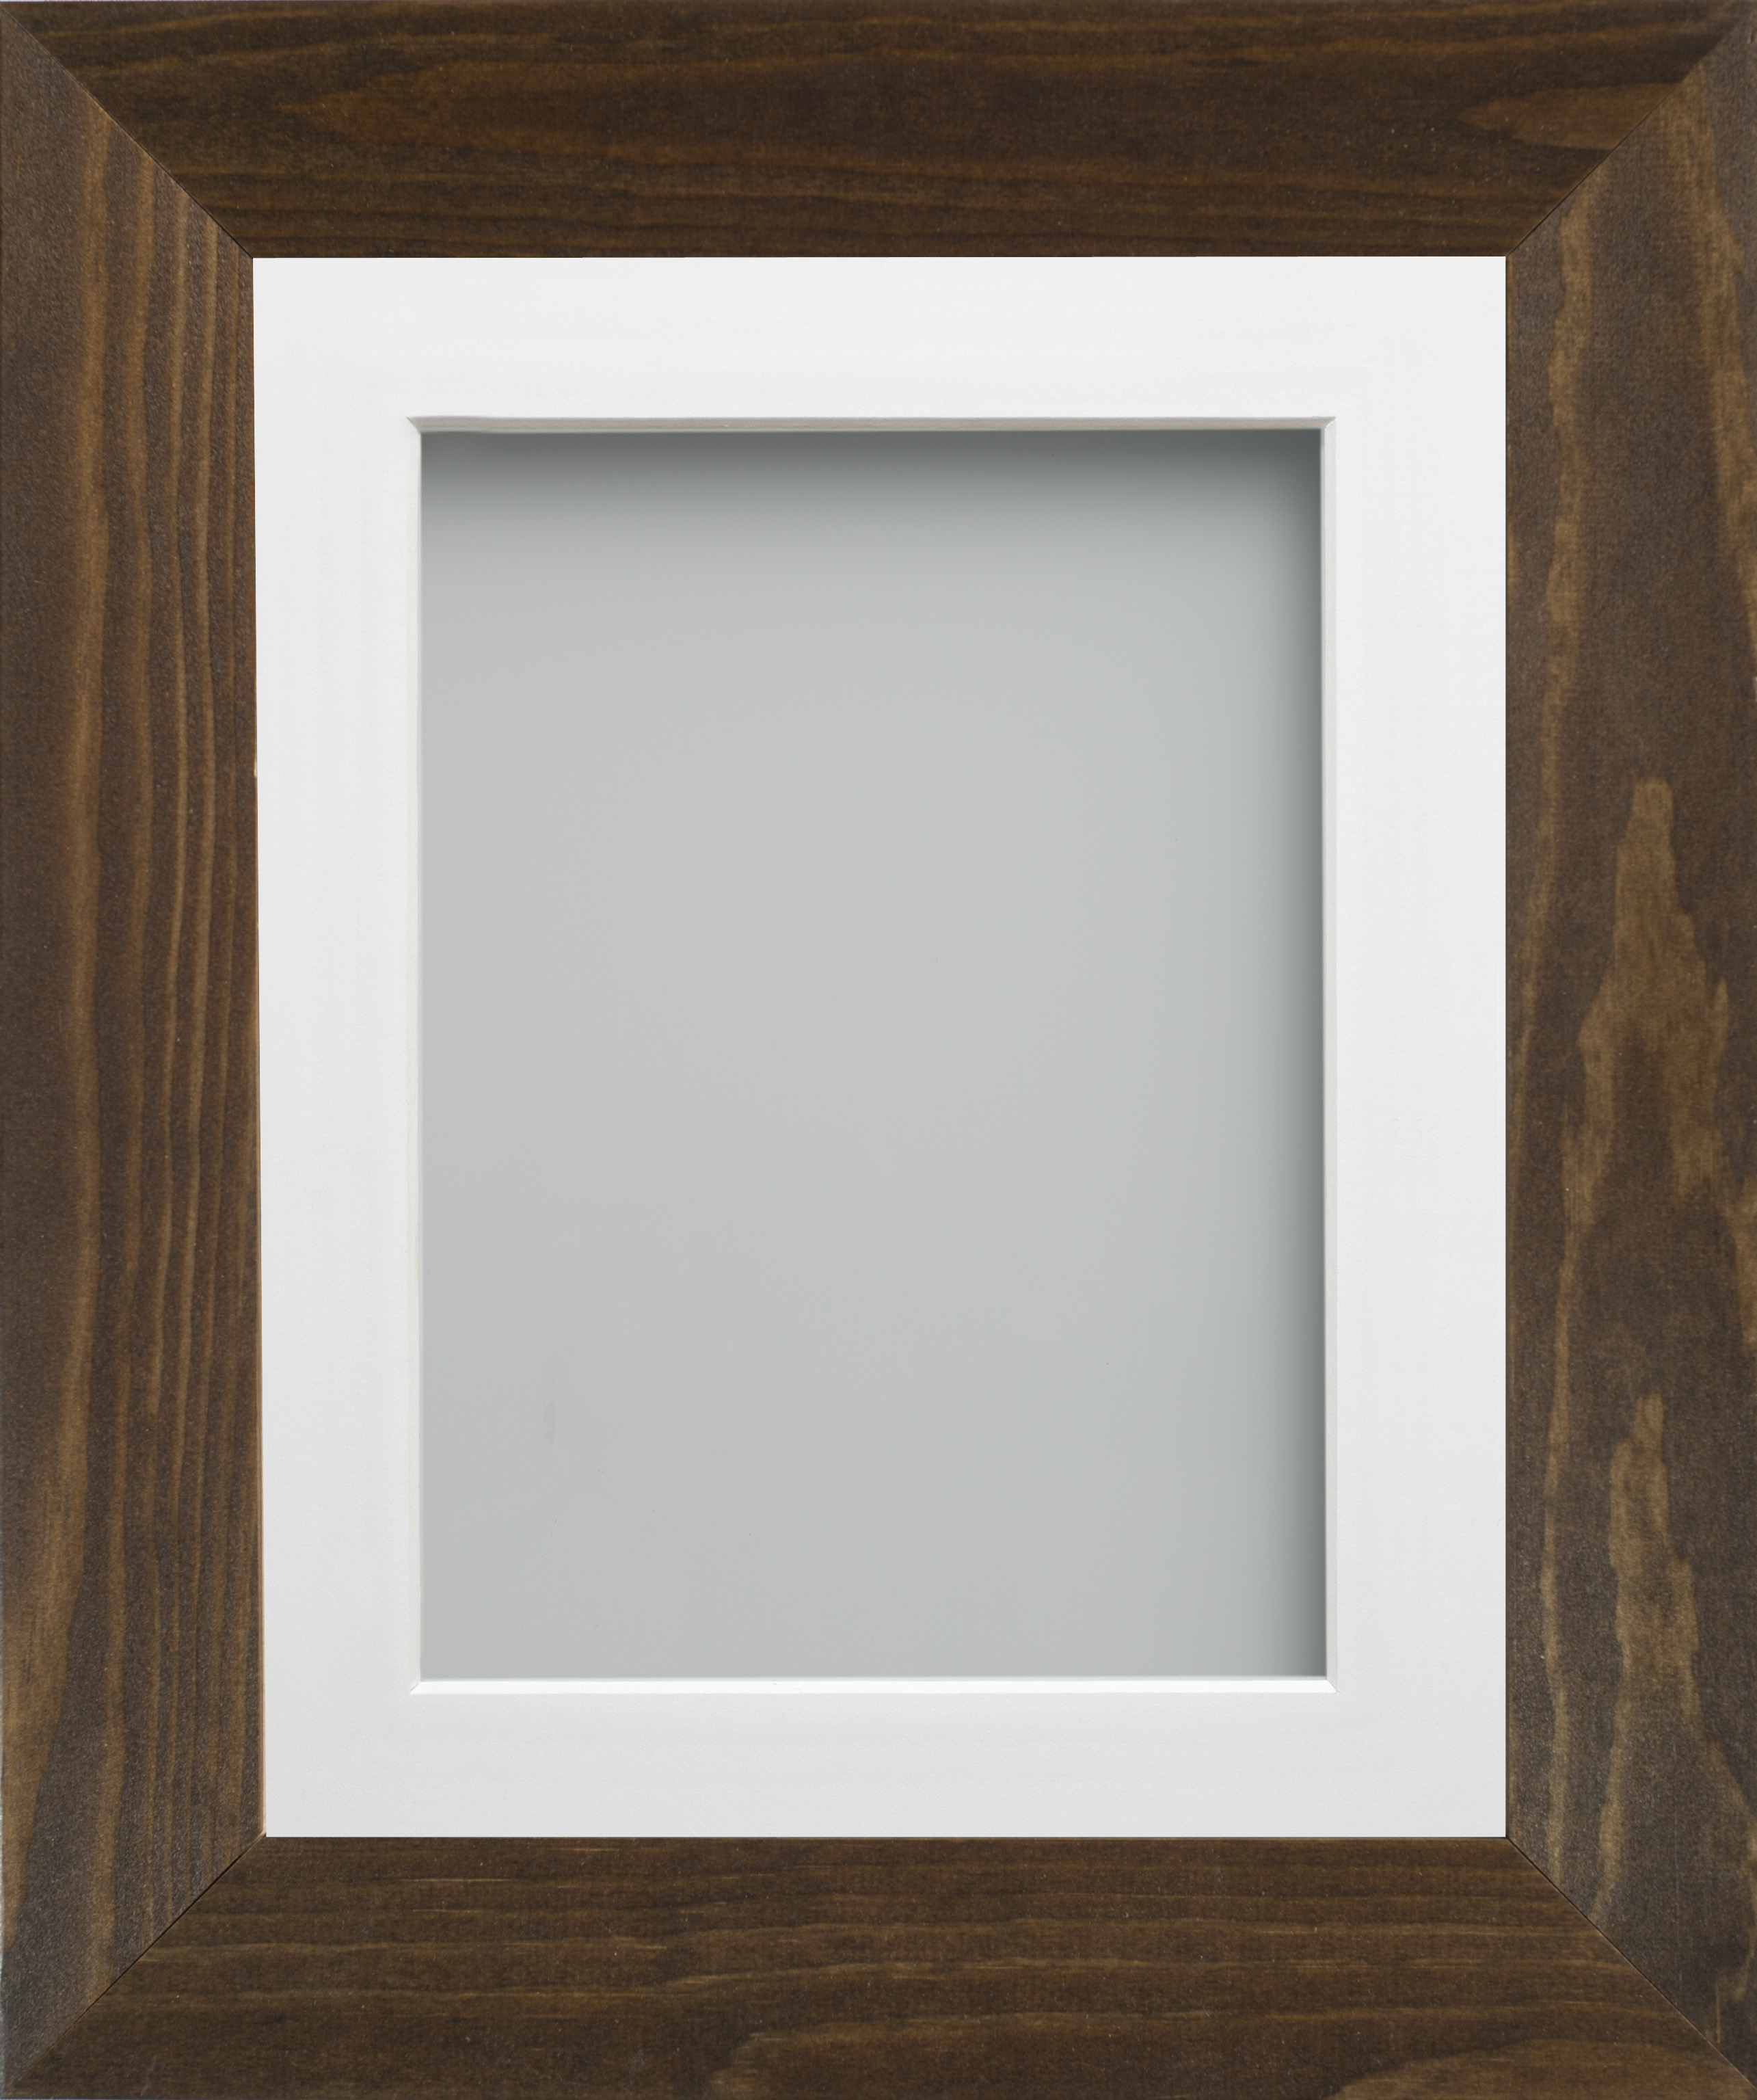 Brown or Golden Oak Large Wooden Picture Photo Frame & Mount   eBay